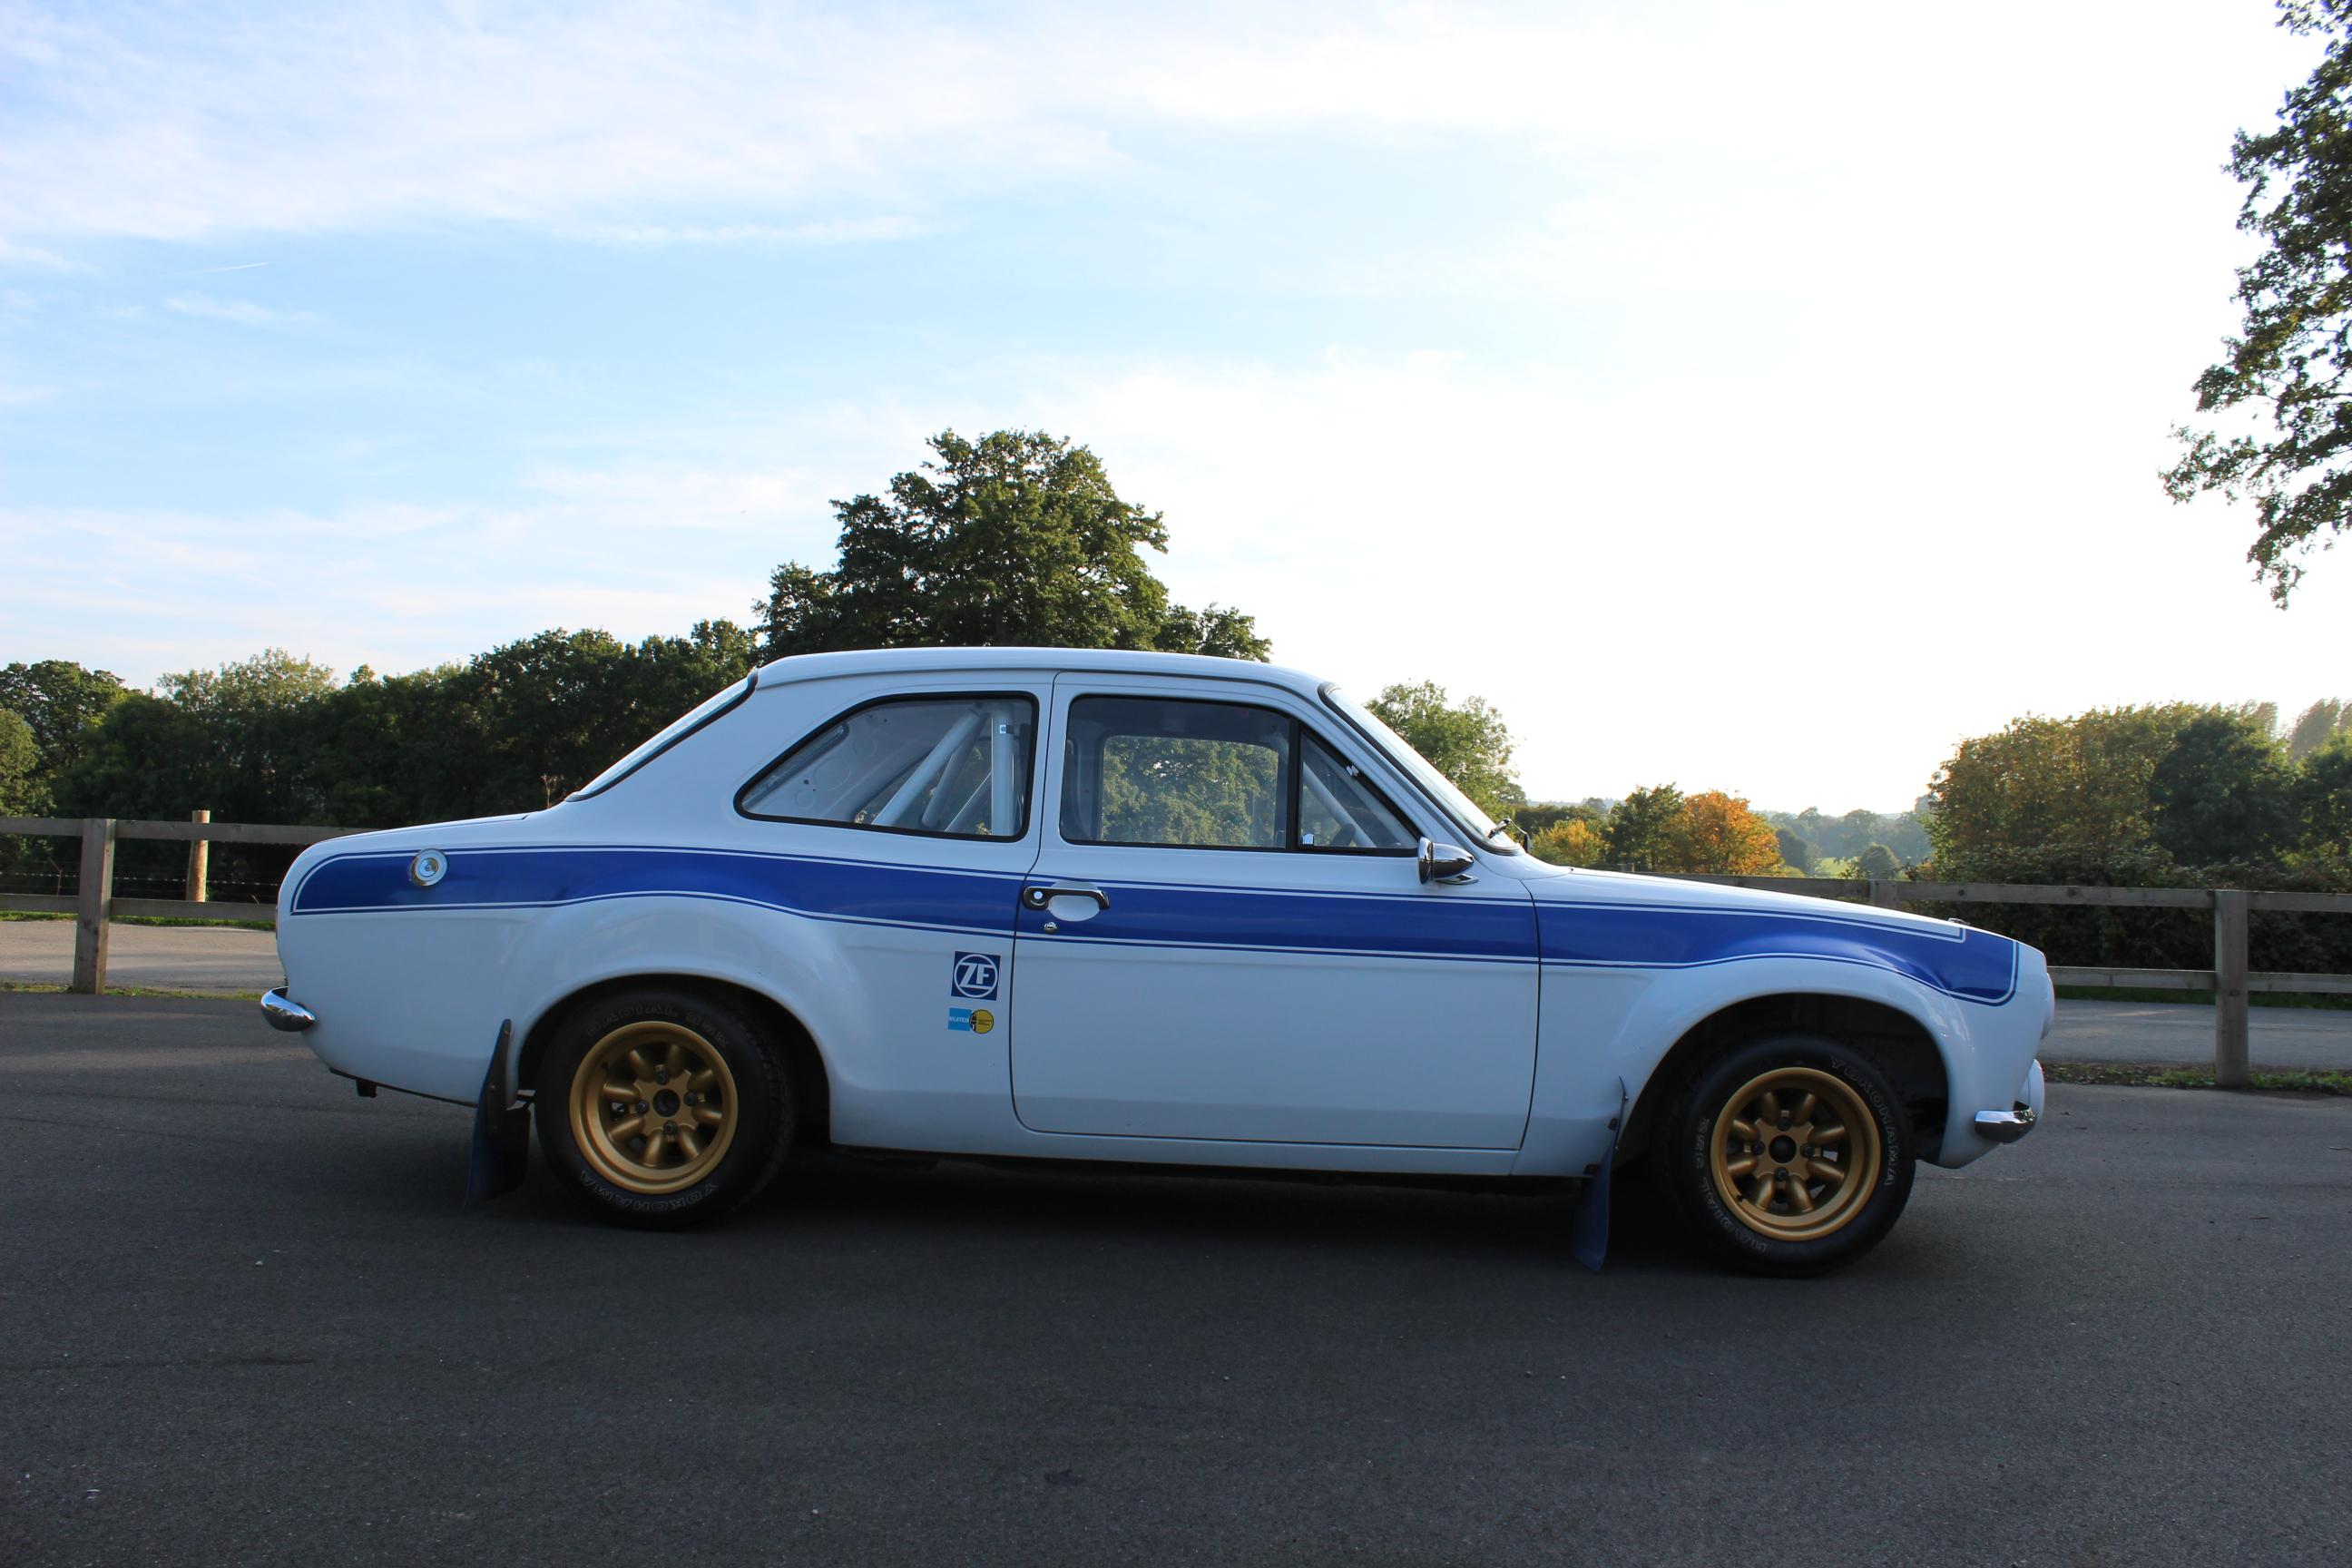 1973 Ford Escort Mk1 RS2000